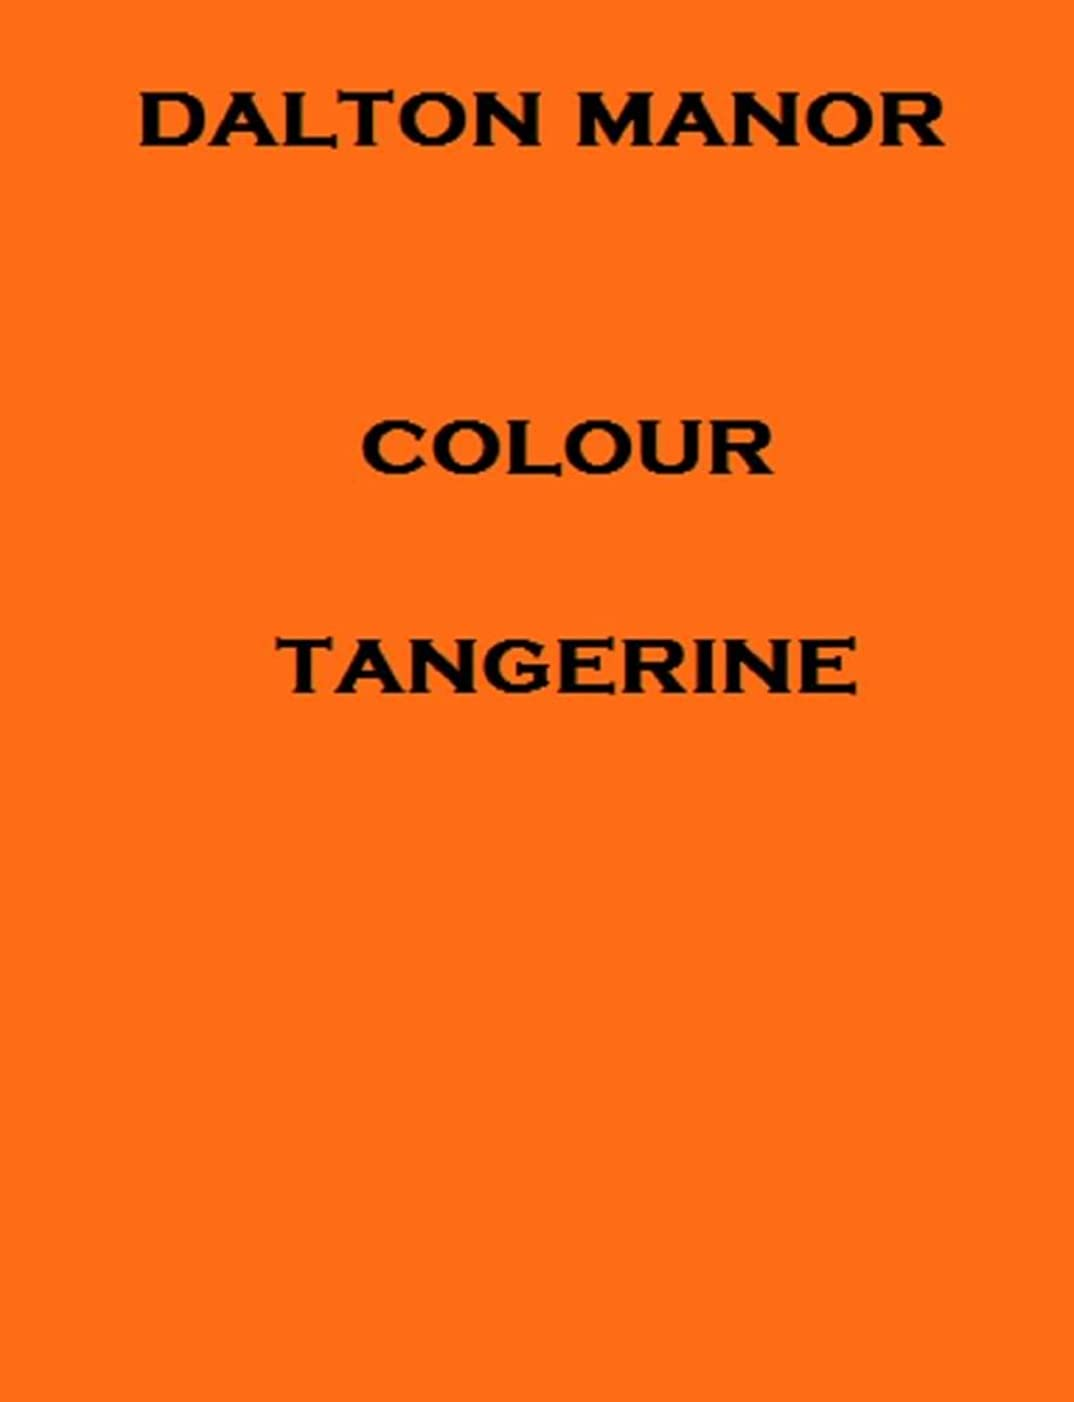 Dalton Manor A4 Coloured Card 250 Sheet Pack 160gm Supplied in a Weston Clear Craft Storage Box - Tangerine 160gm